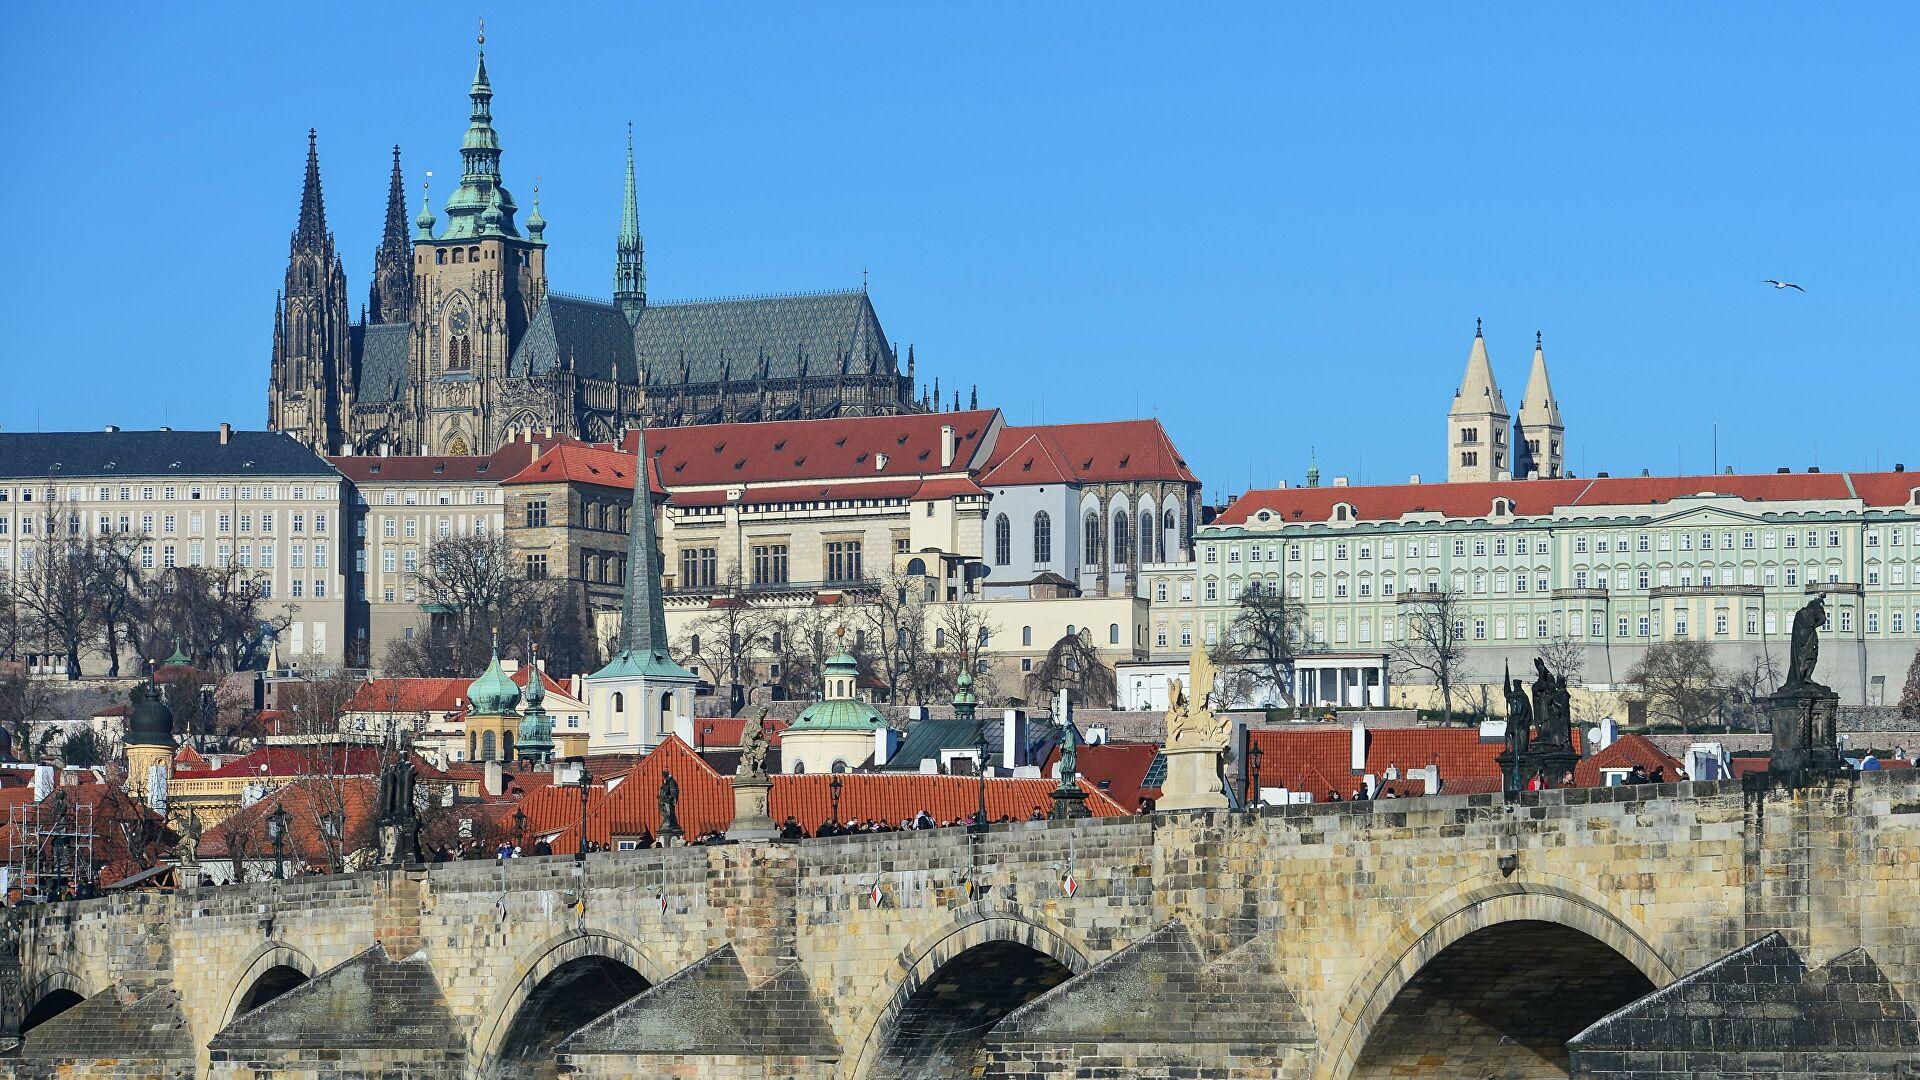 Premijer Češke pozvao na smirivanje tenzija između Moskve i Praga